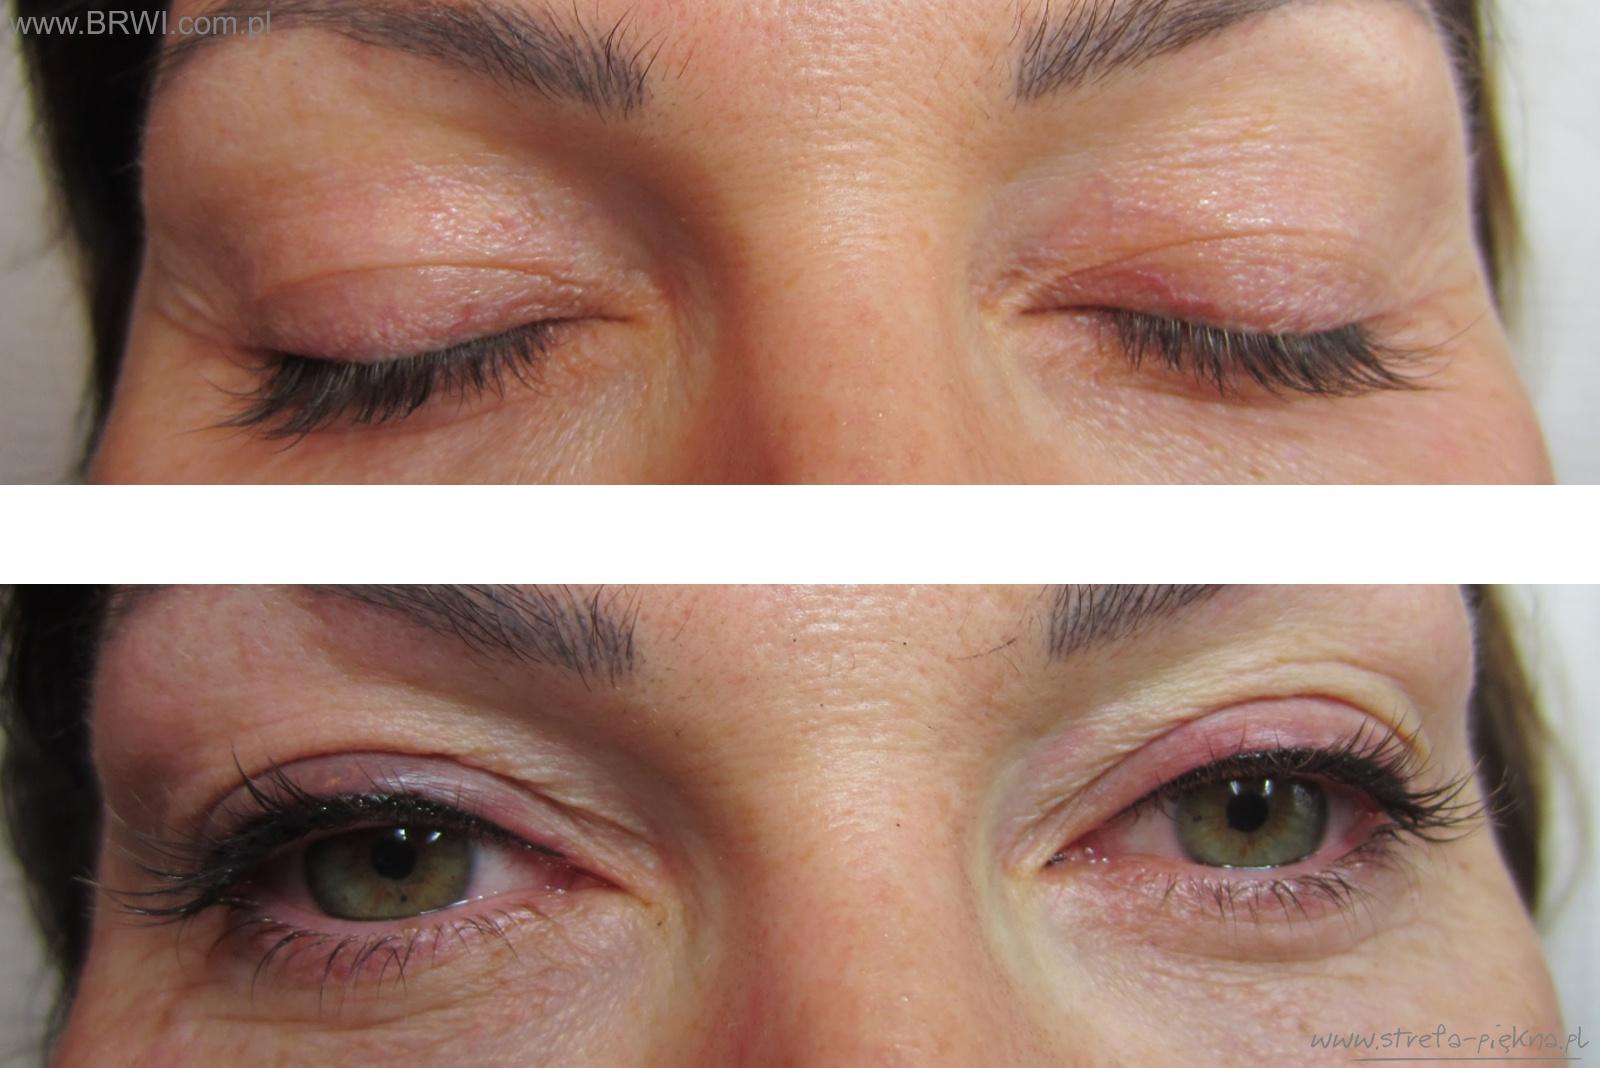 Makijaż Permanentny Salon Urody Strefa Piękna Gliwice Medycyna